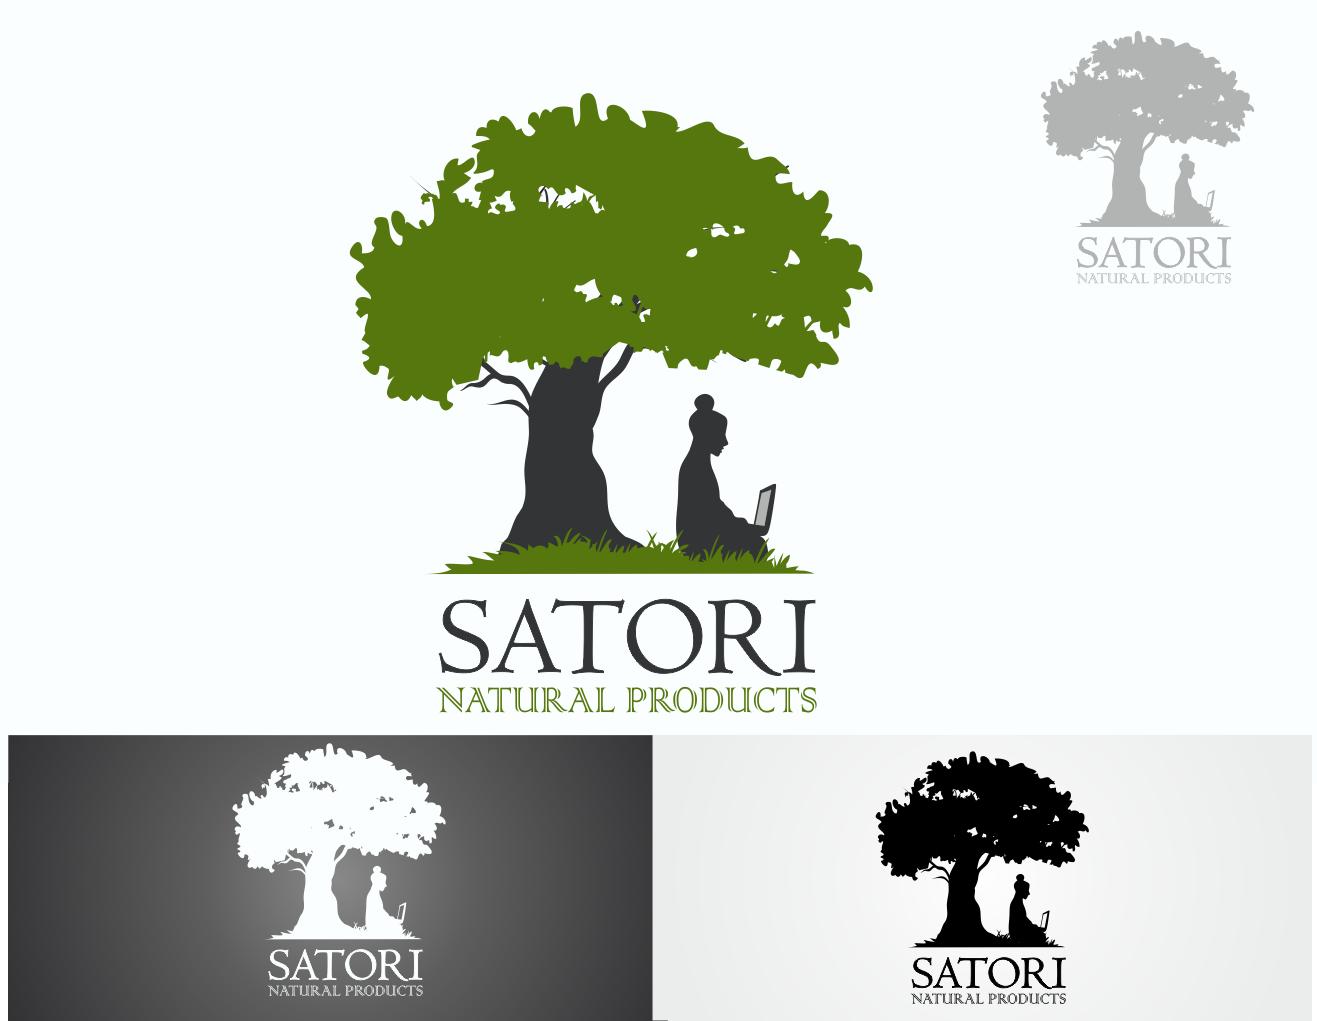 Satori Natural Products needs a new logo